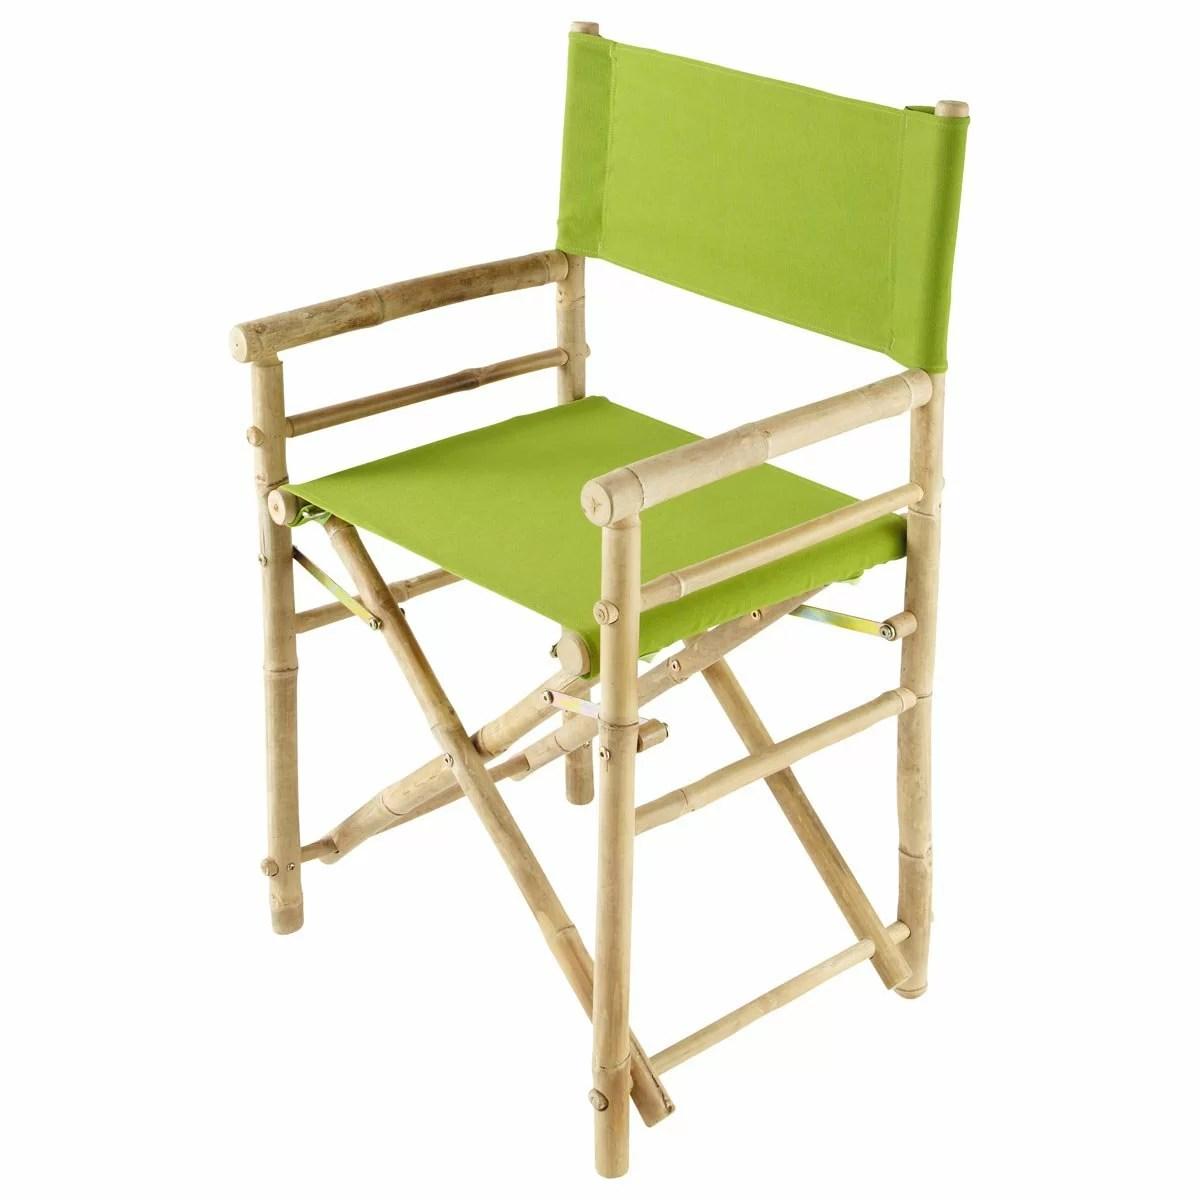 bamboo directors chairs chair cover depot voucher code zew hand crafted outdoor indoor director